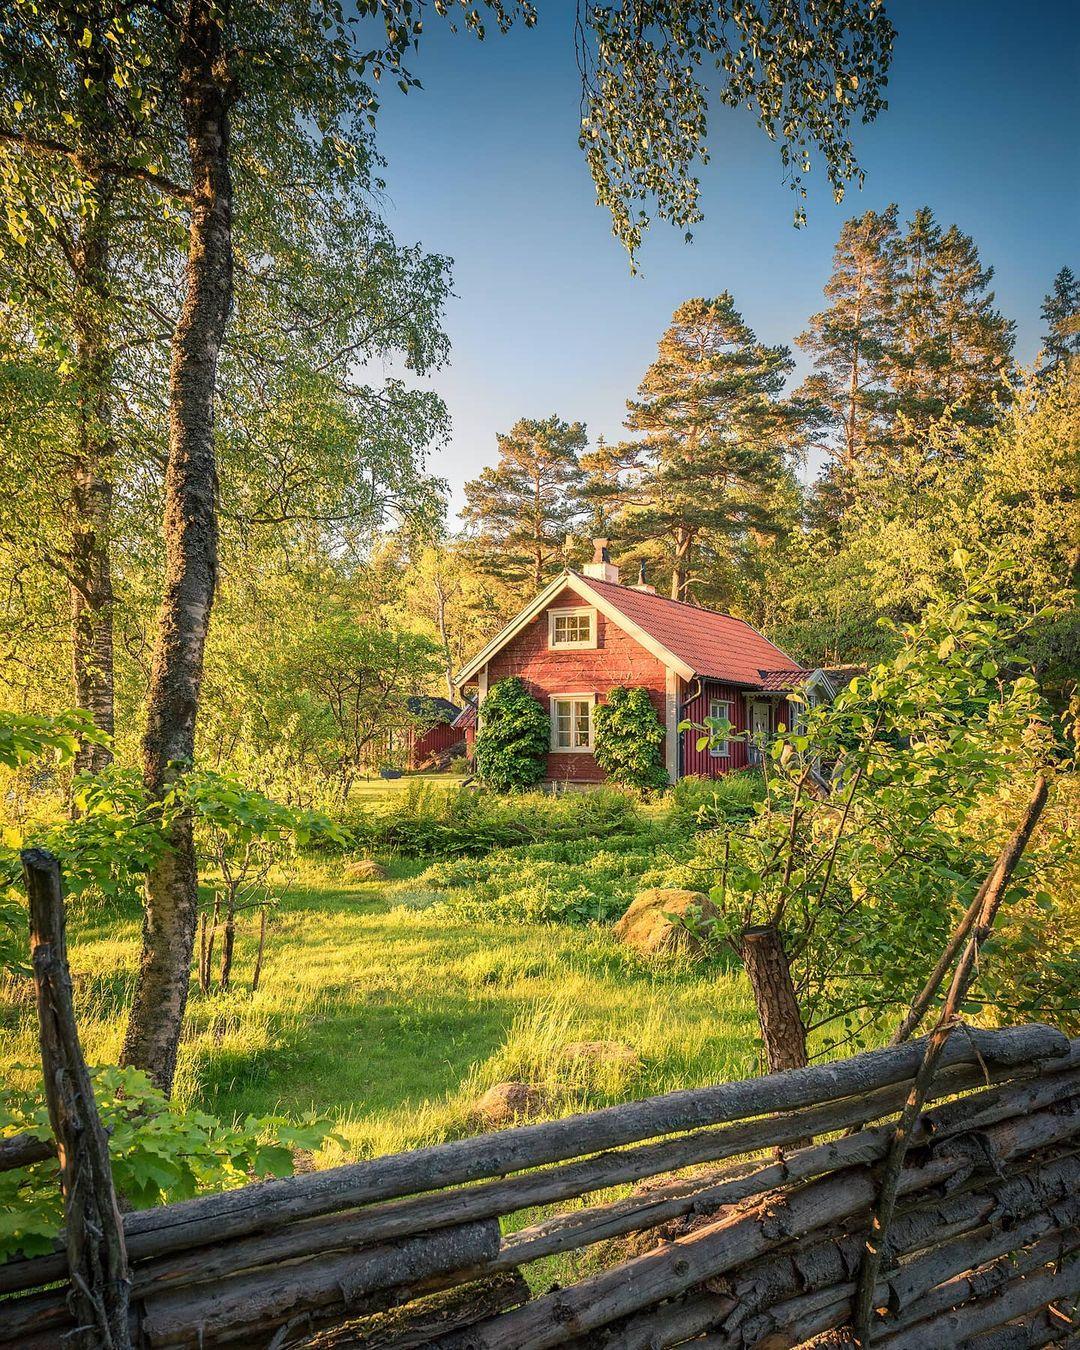 Красота природы Швеции на снимках Кристиана Линдстена